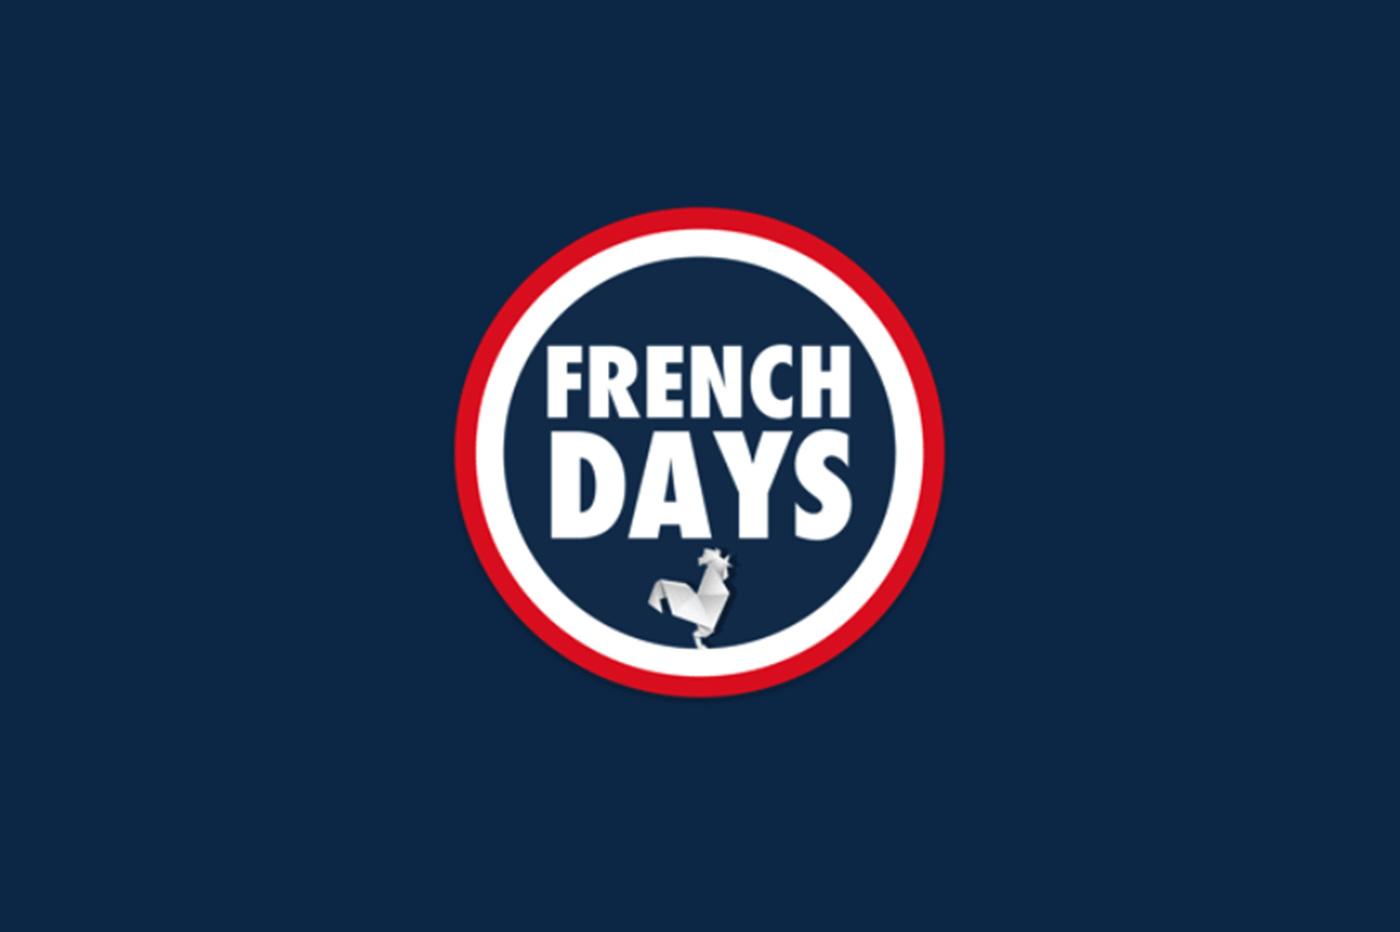 French Days : Amazon brade son stock, voici les 10 offres dingues 🔥